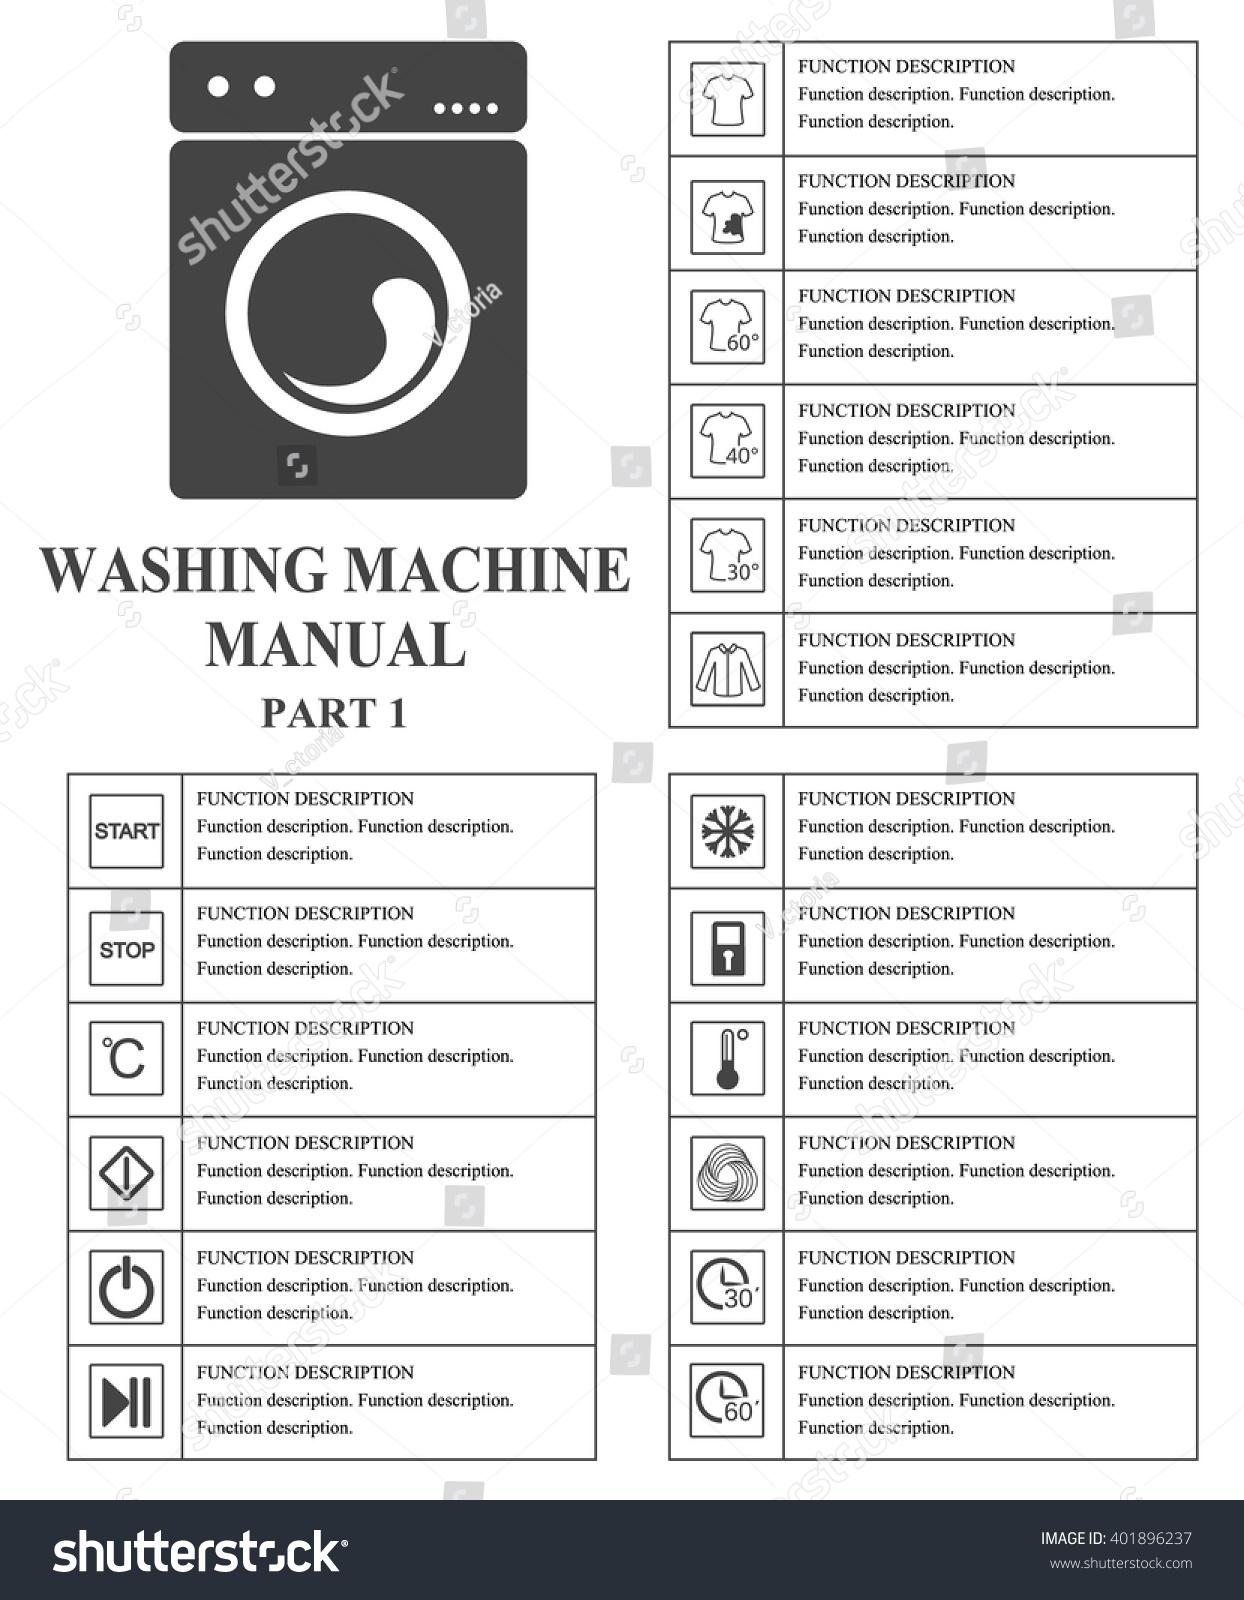 Oven manual symbols part 1 instructions stock vector 401896237 oven manual symbols part 1 instructions signs and symbols for washing machine exploitation manual biocorpaavc Gallery